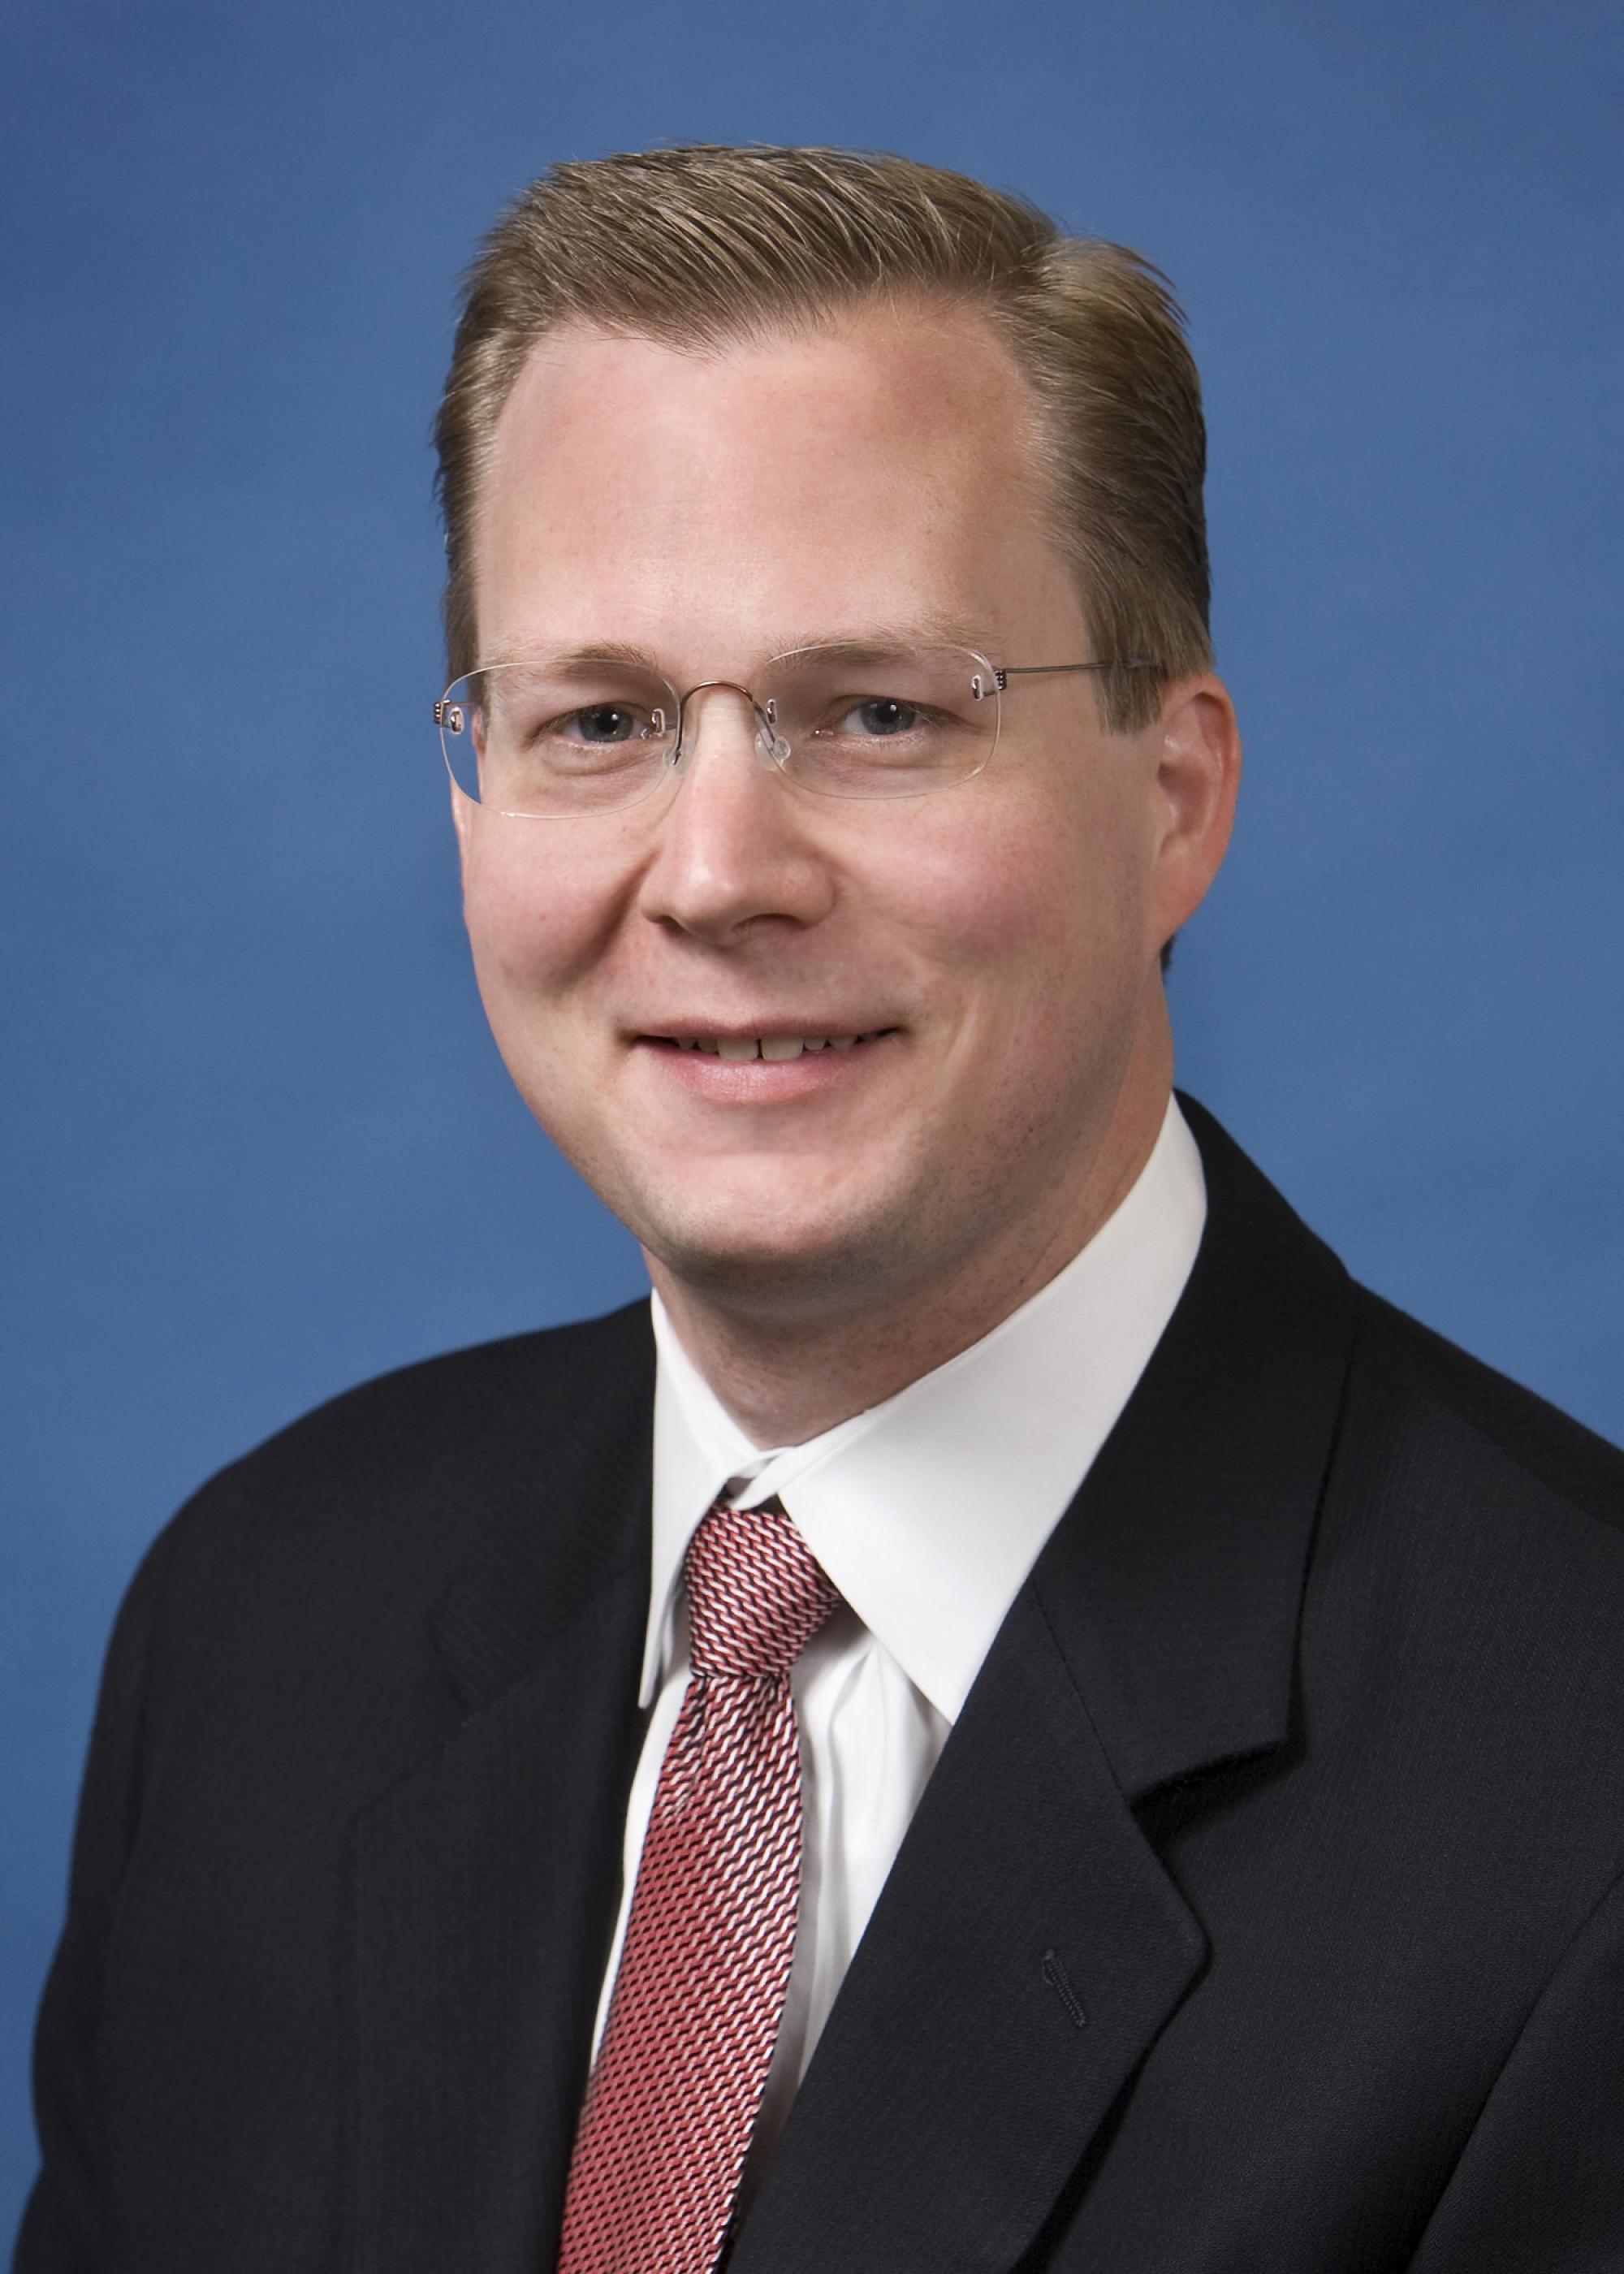 Dr. Christian O. Twiss